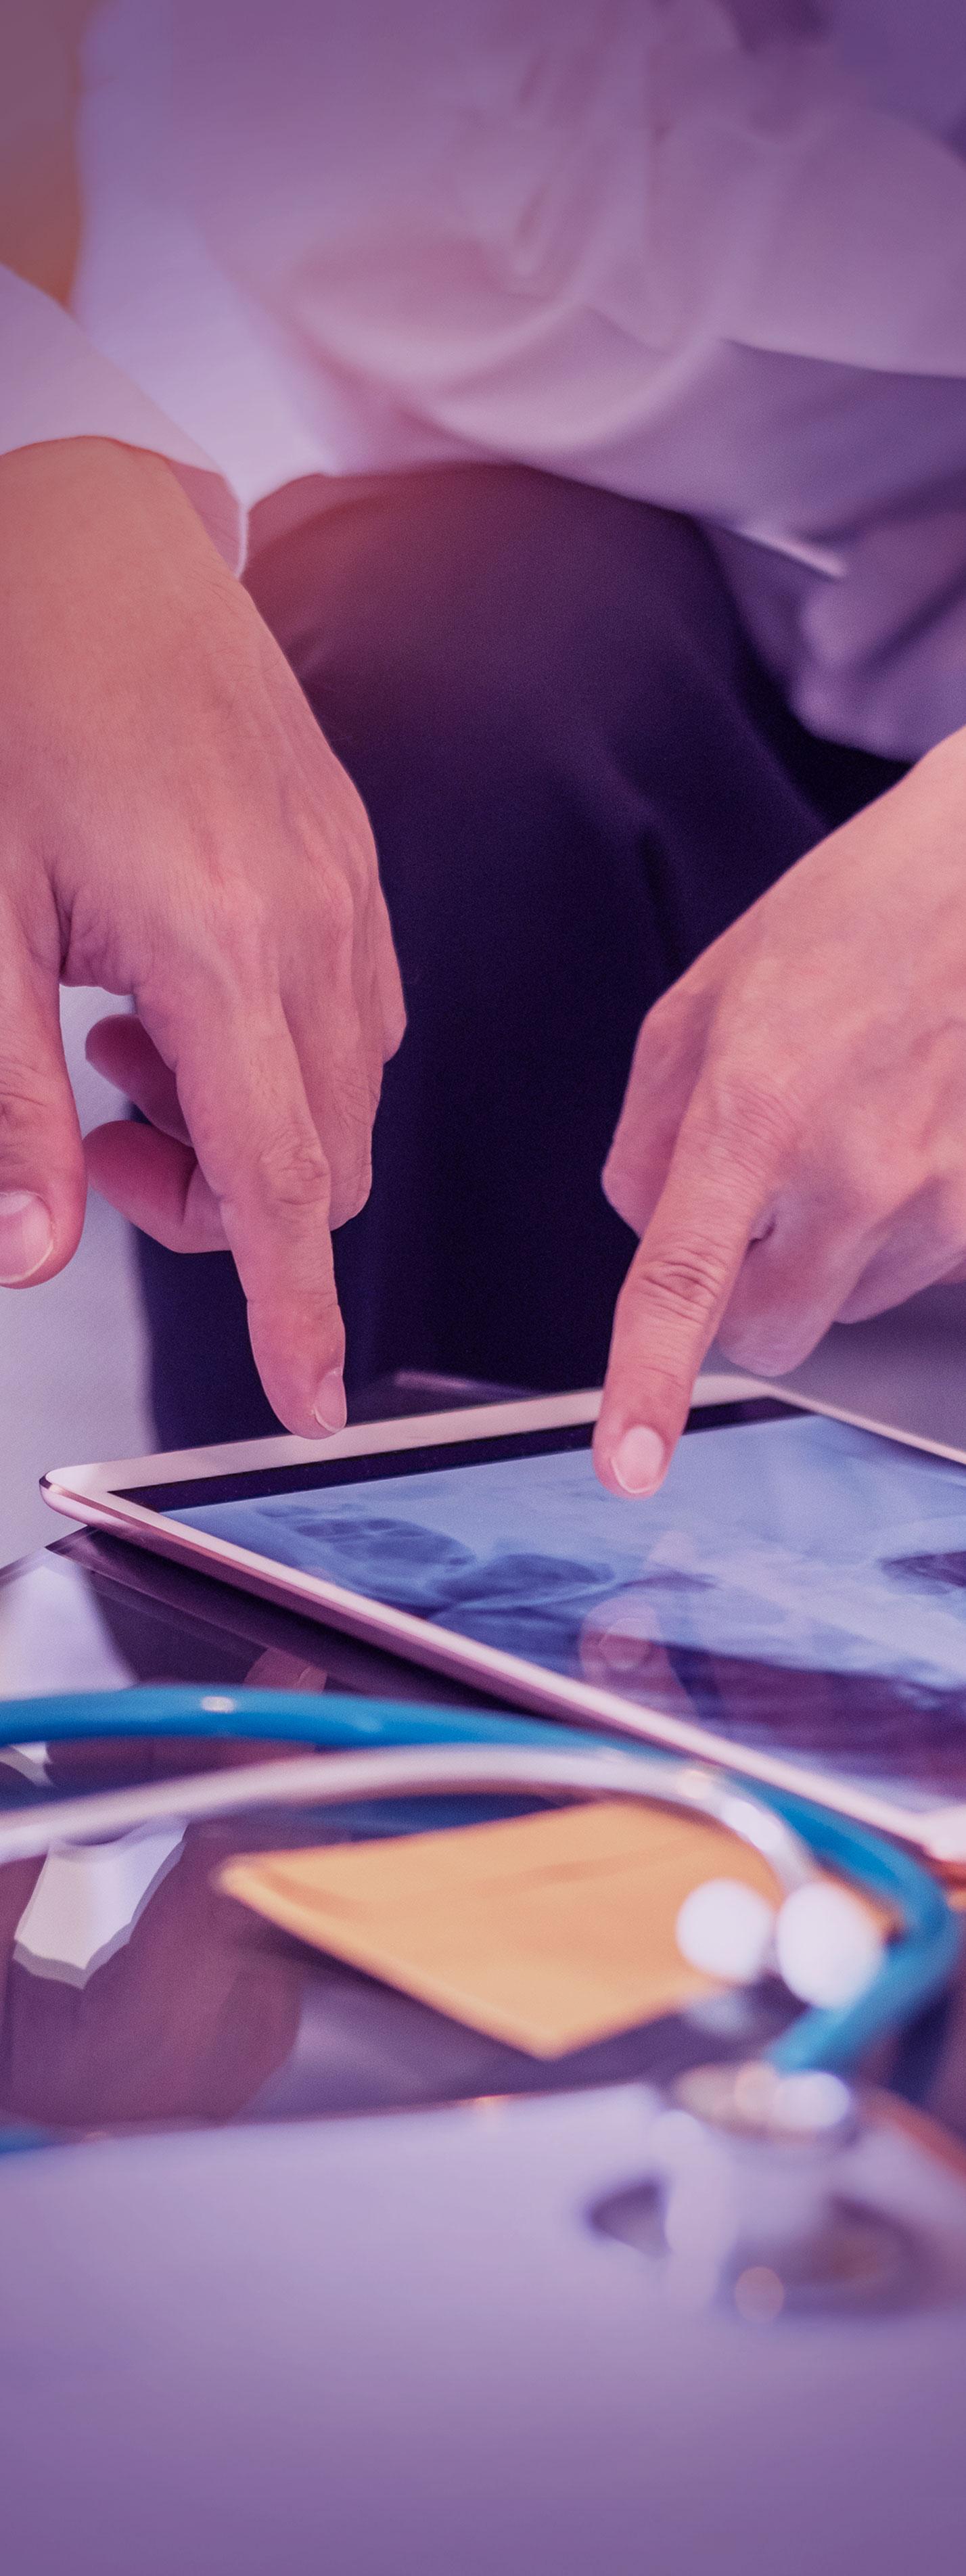 Digital Media report 2019 - Video-on-Demand